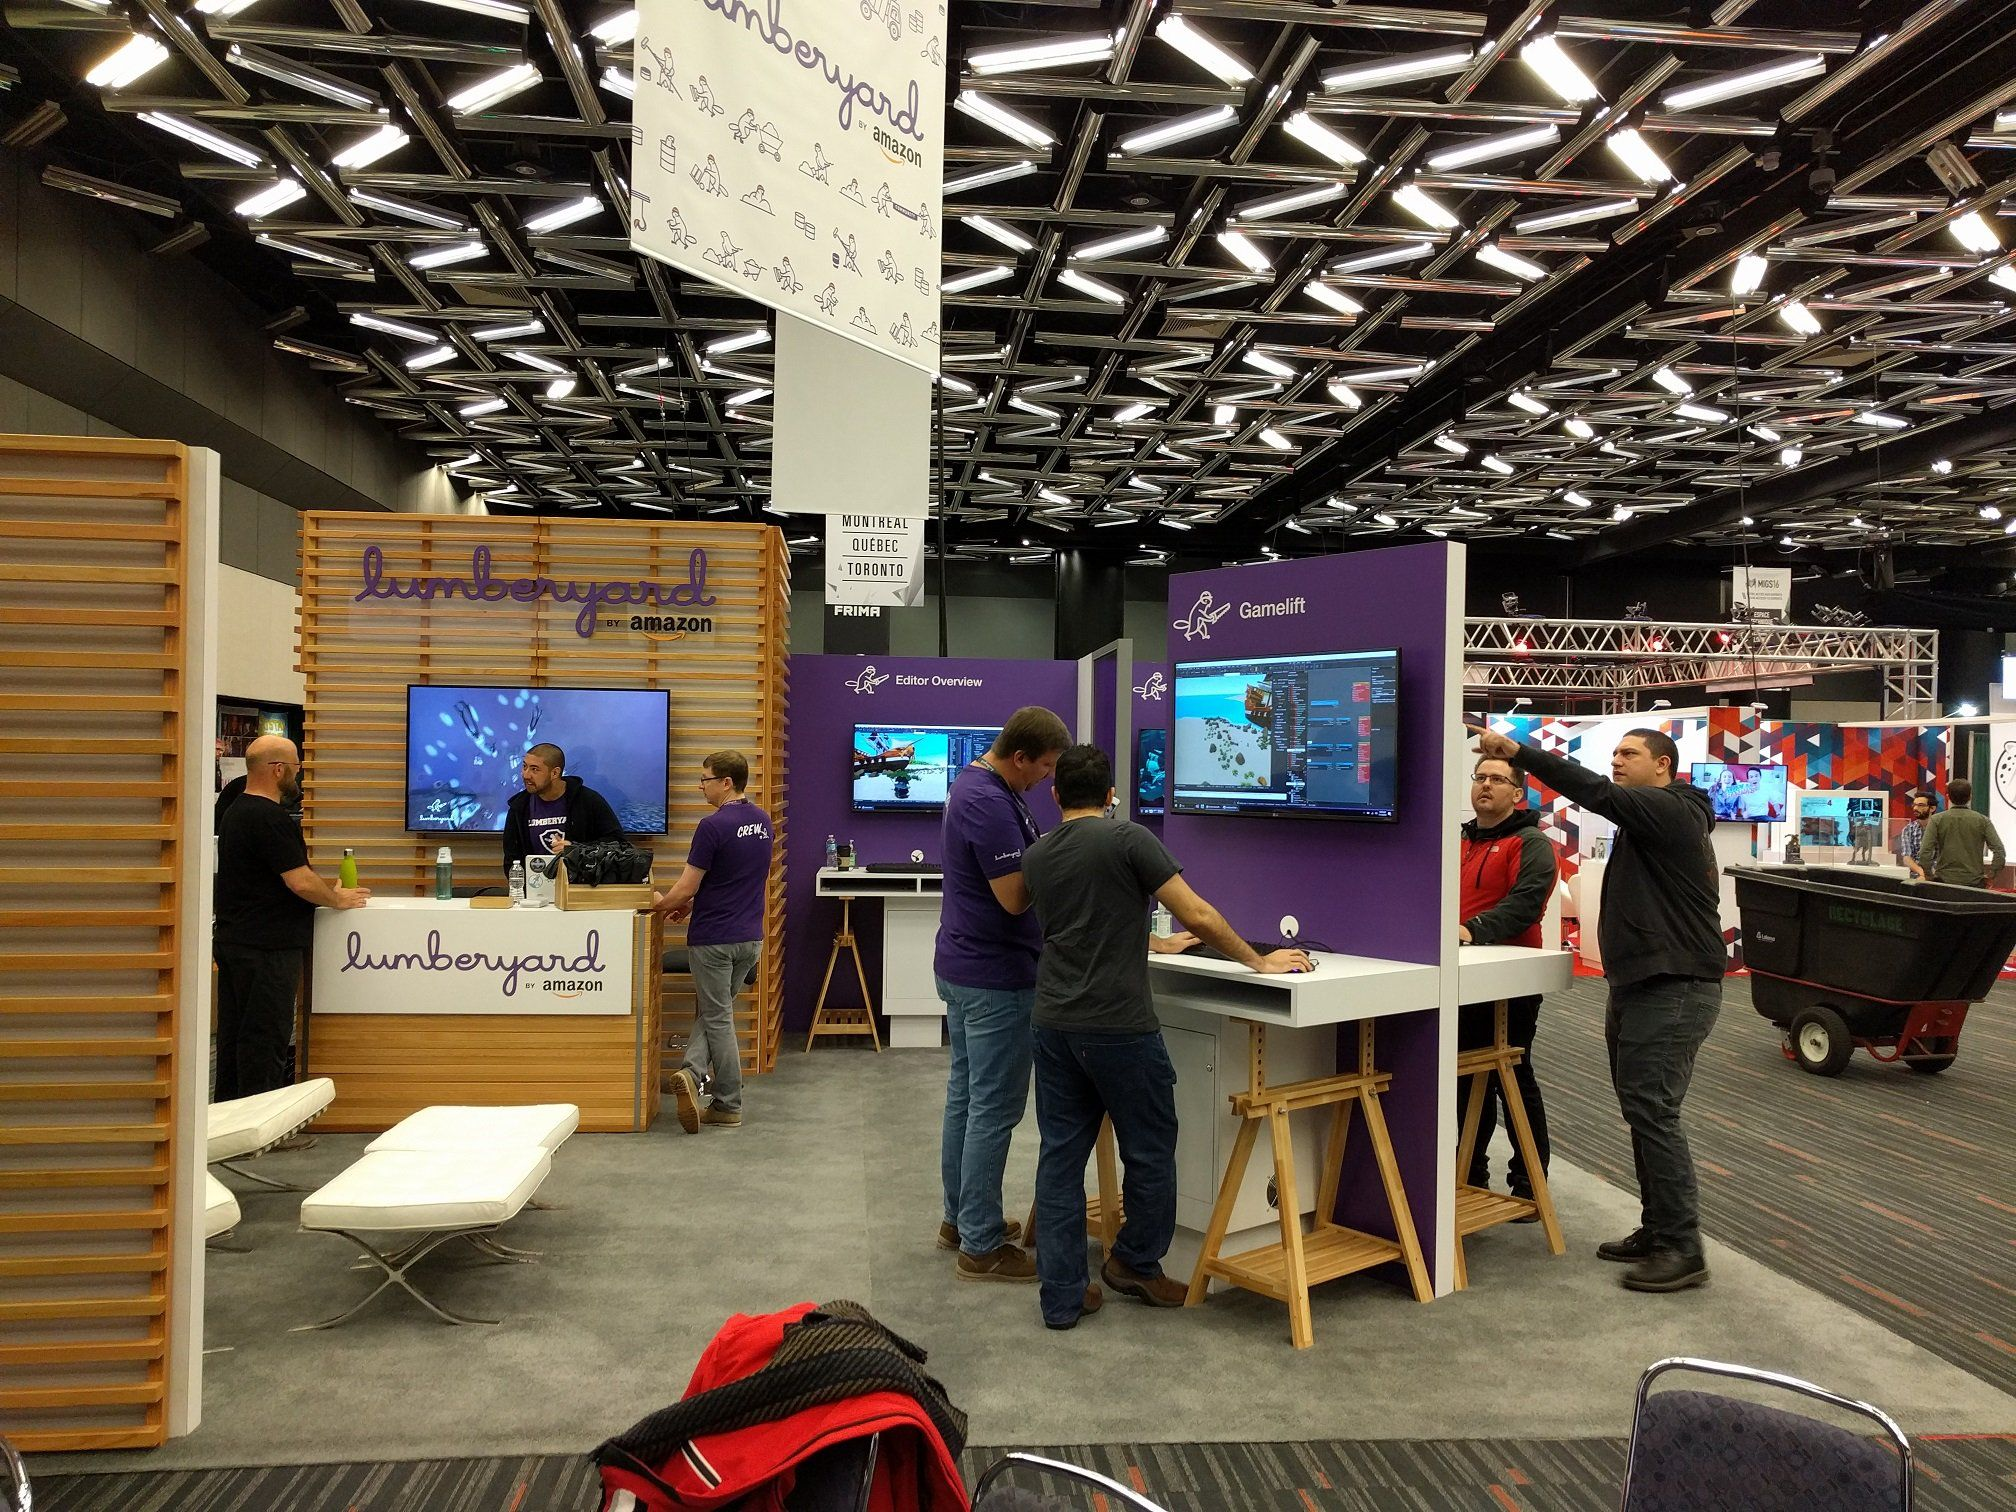 GameDeveloper4u: #gamedev #Lumberyard at MIGS__ running through final setup. Excited to talk with all the #Montre http://pic.twitter.com/BpGmIKp6mq   Game Designer World (@LoveDesignGame) November 13 2016